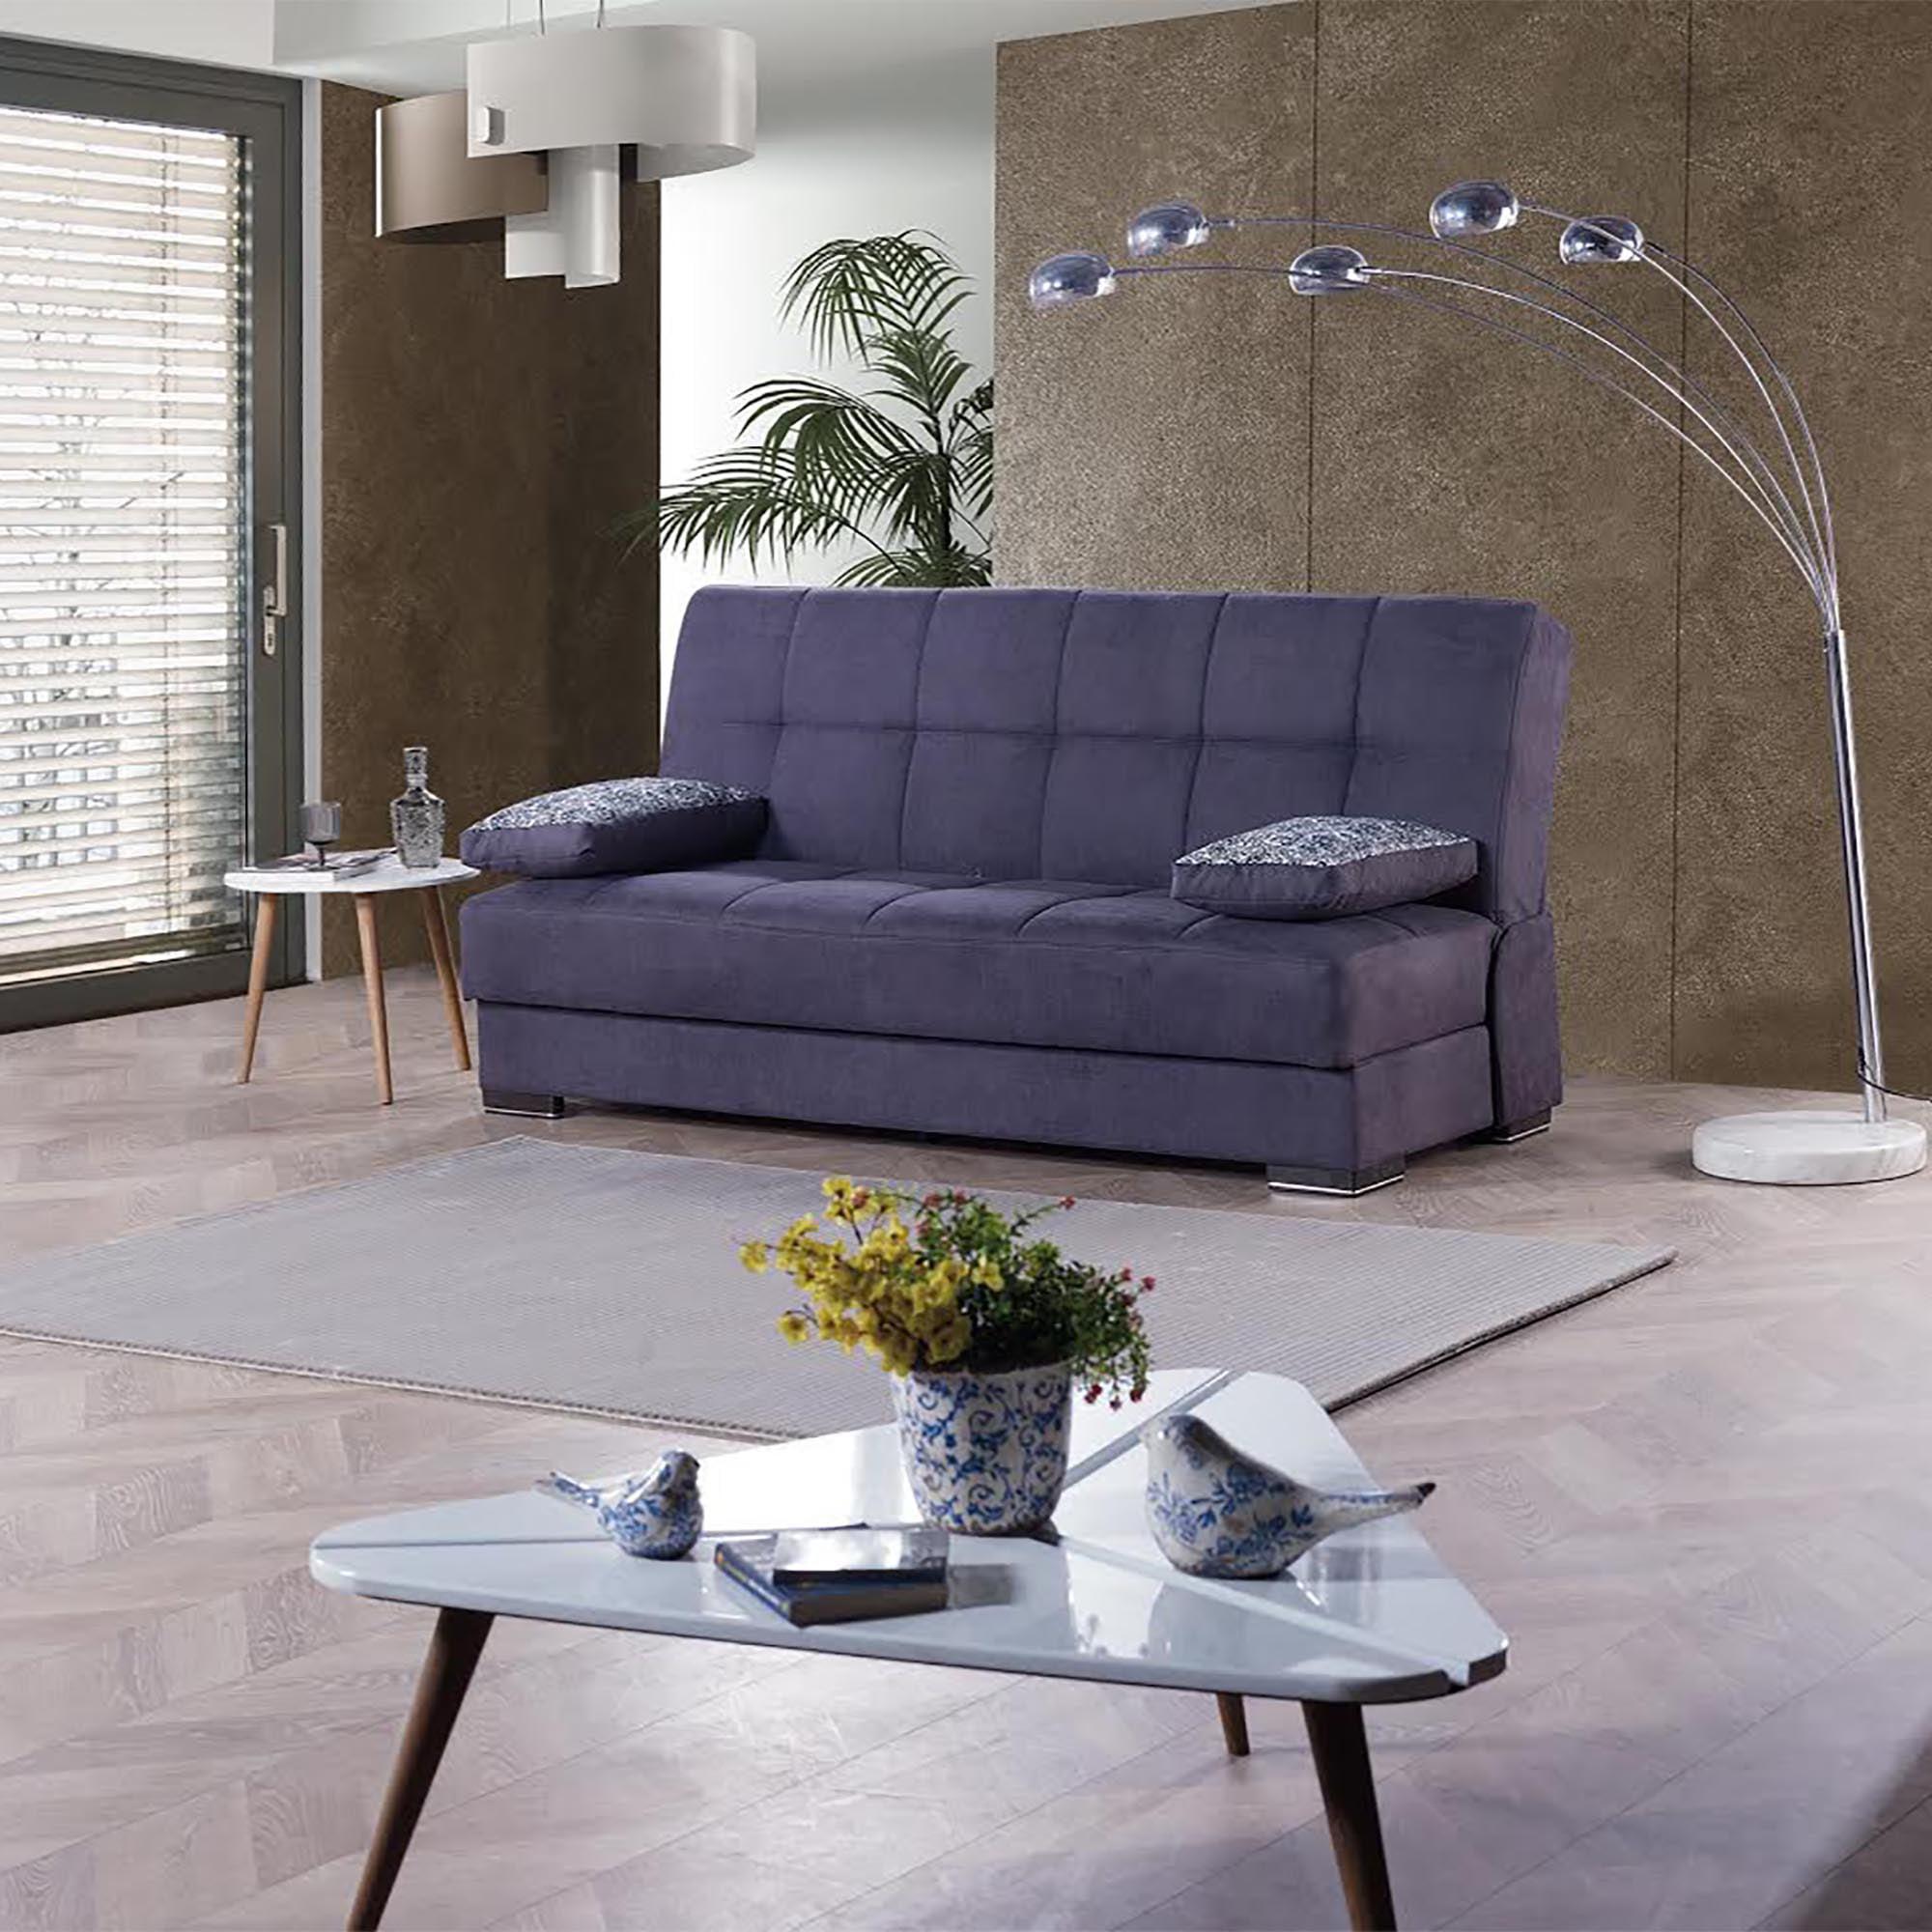 Soho Armless Sleeper Sofa Bed with Storage   Walmart.com ...